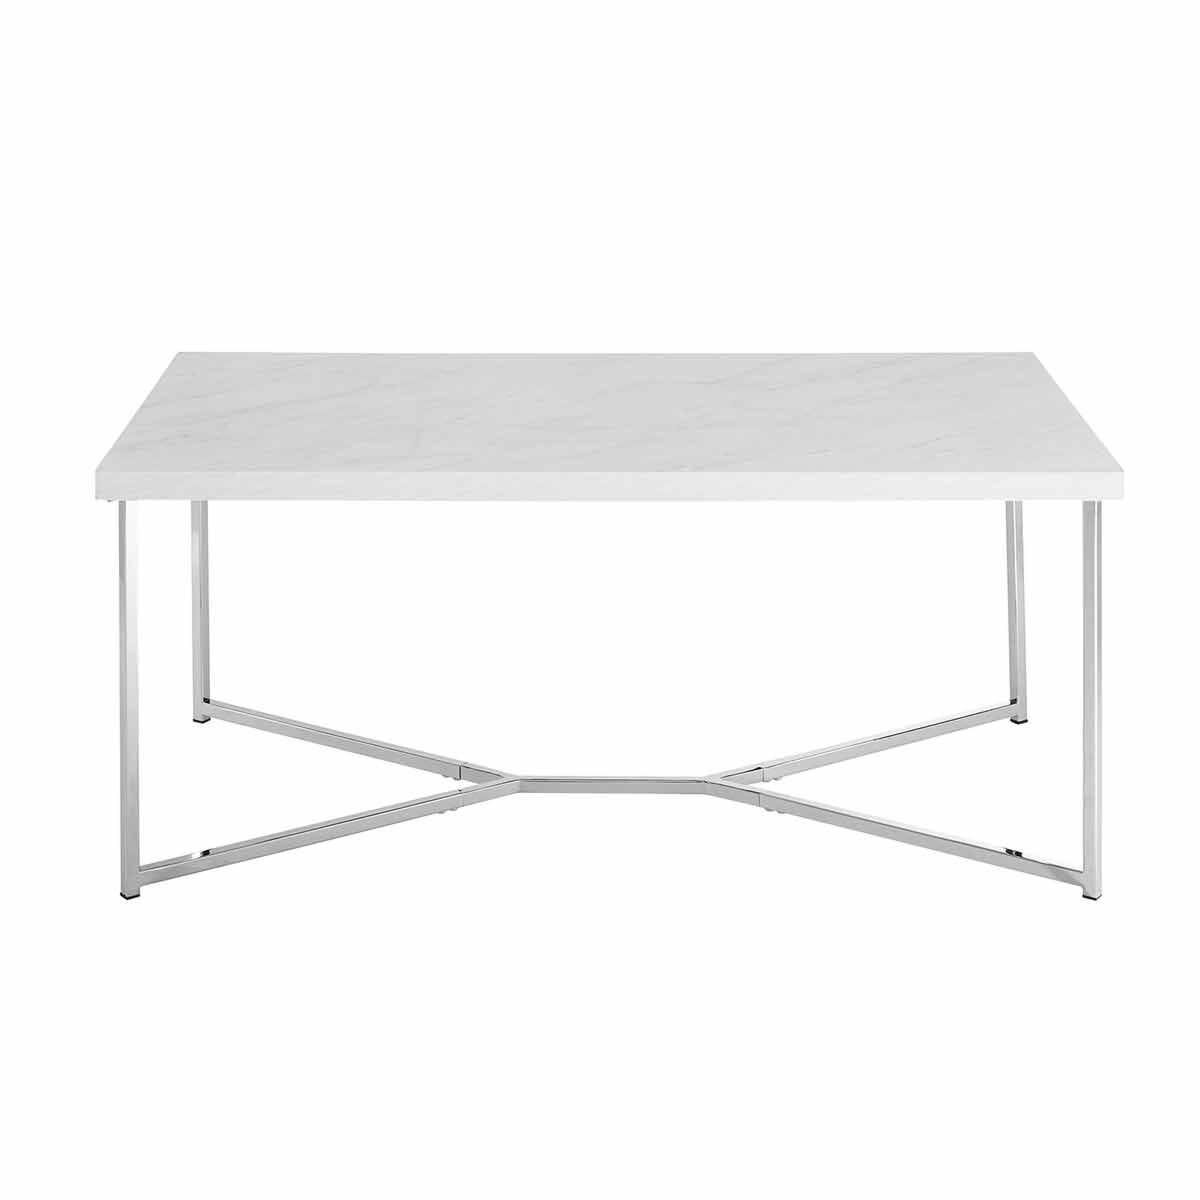 Lugo Mid Century Modern Rectangular Coffee Table Chrome